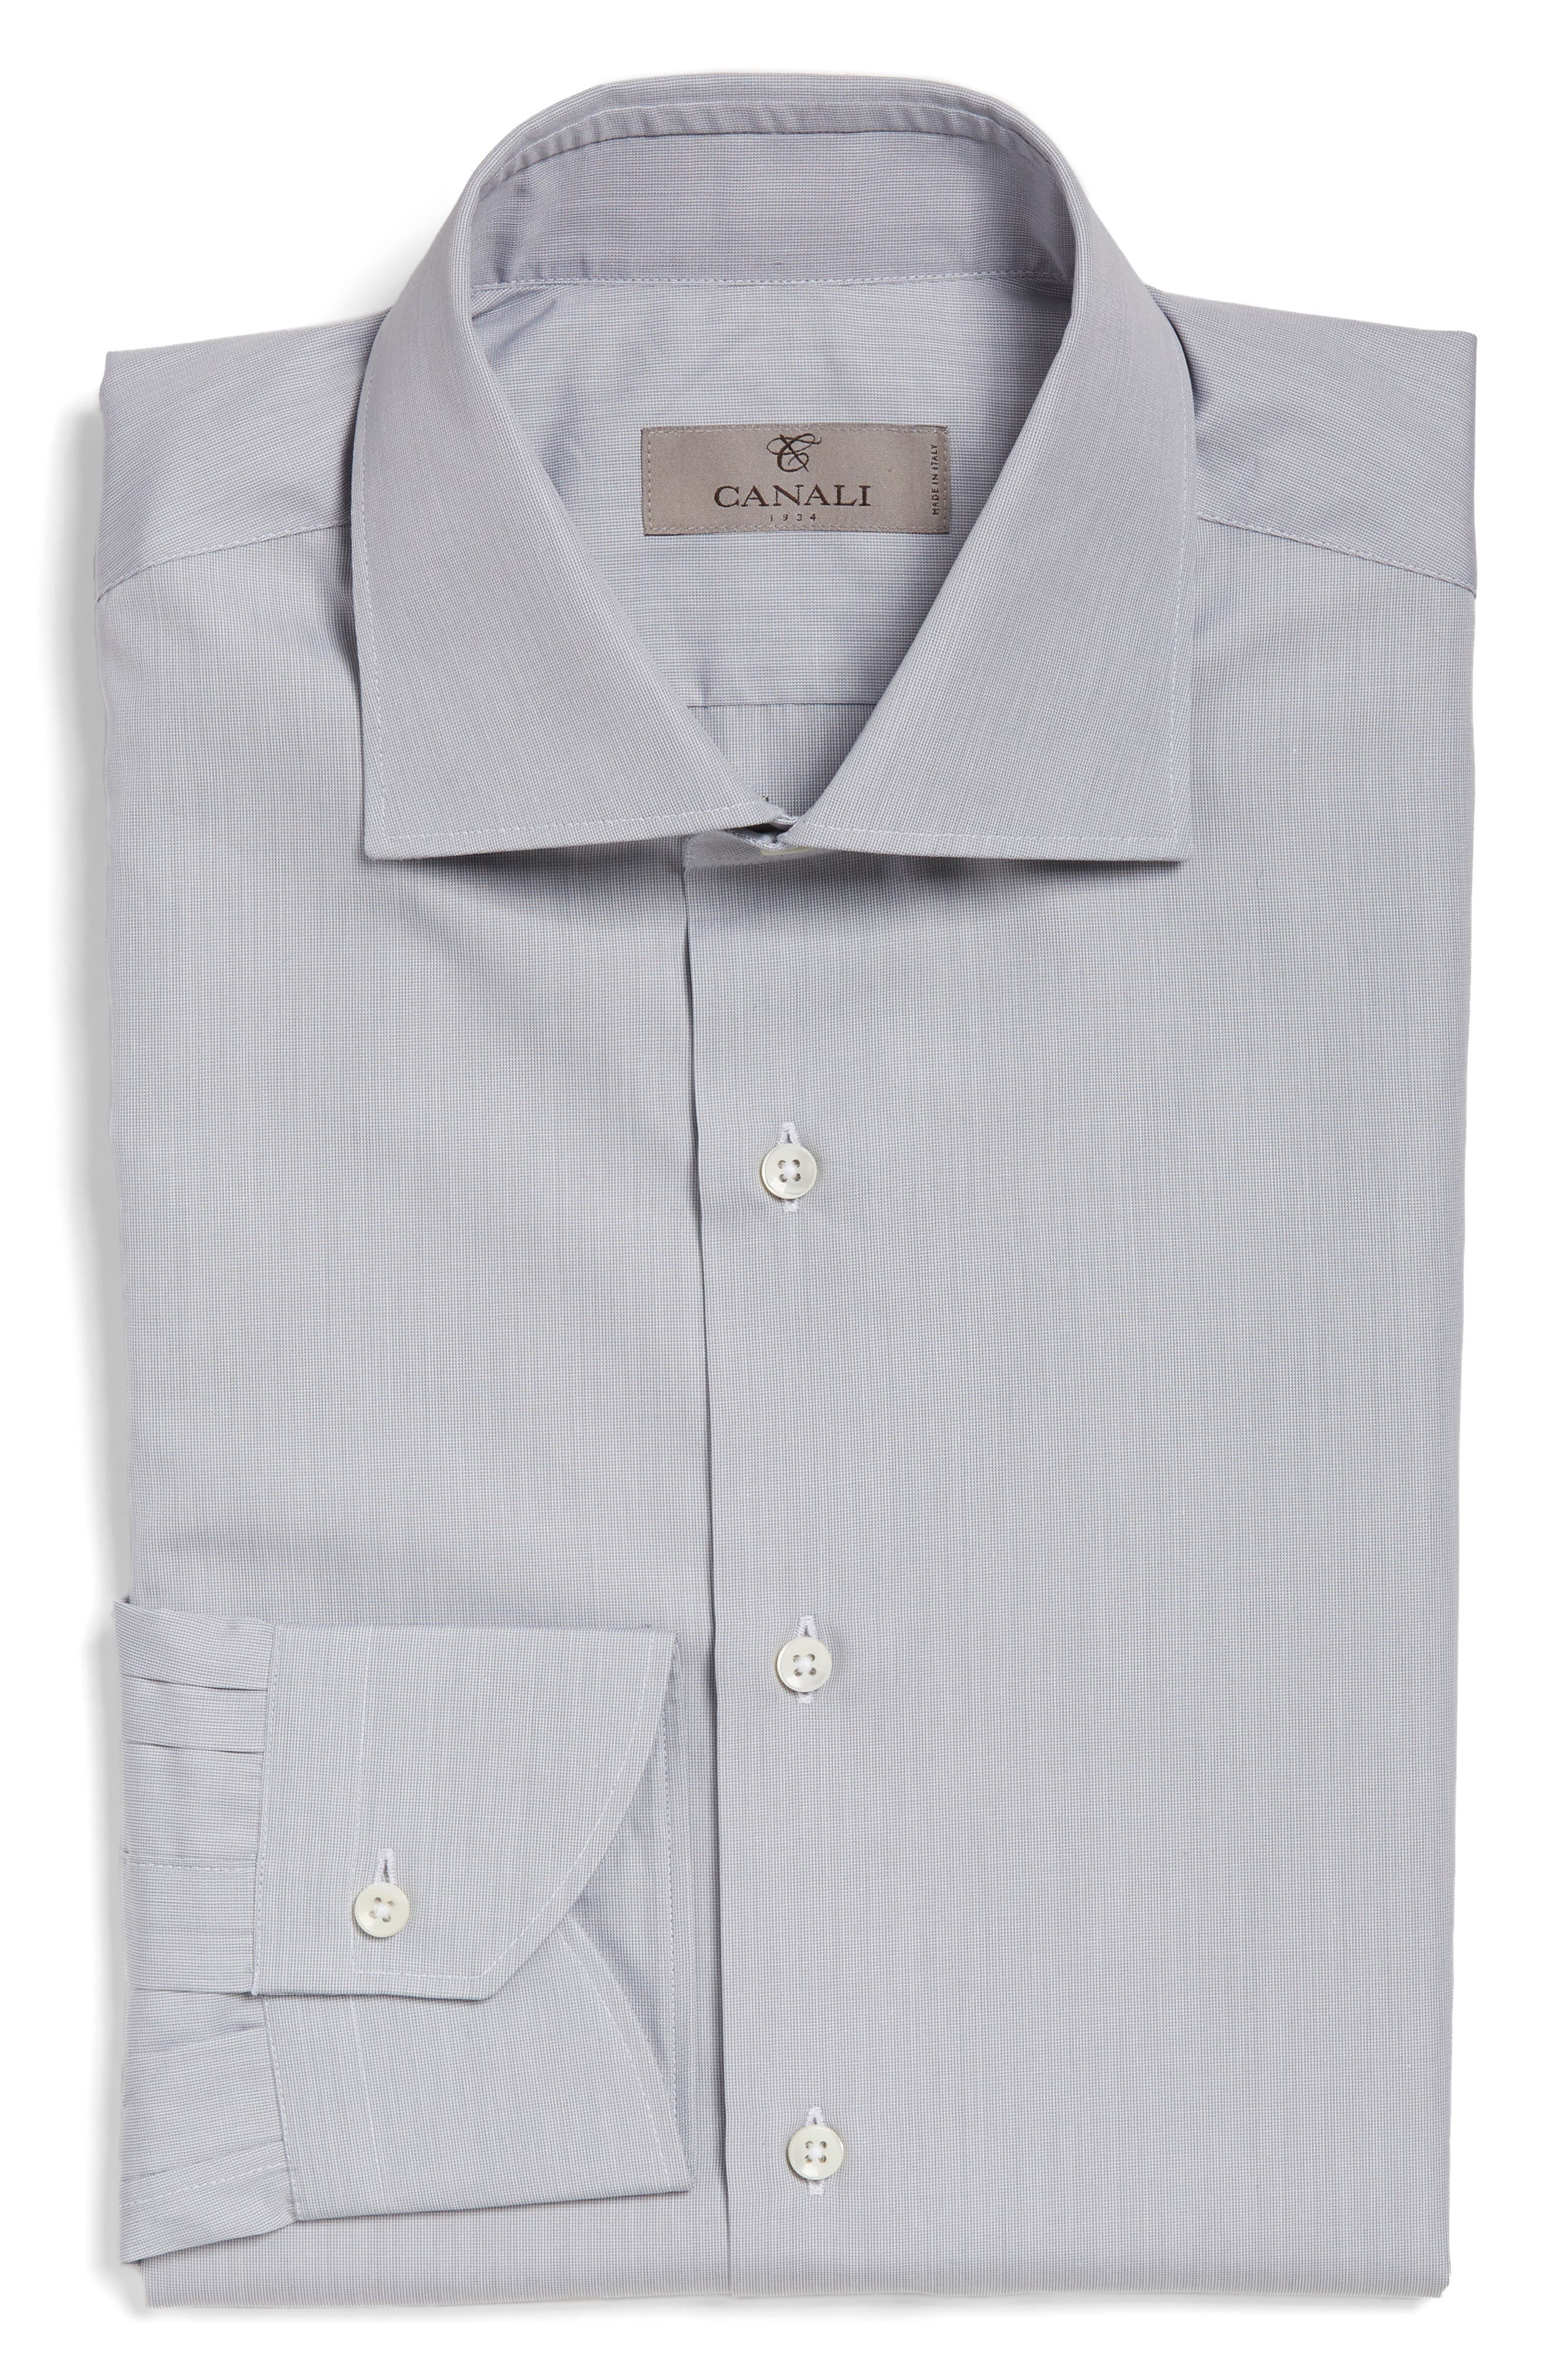 Regular Fit Solid Dress Shirt,                         Main,                         color, Light Grey